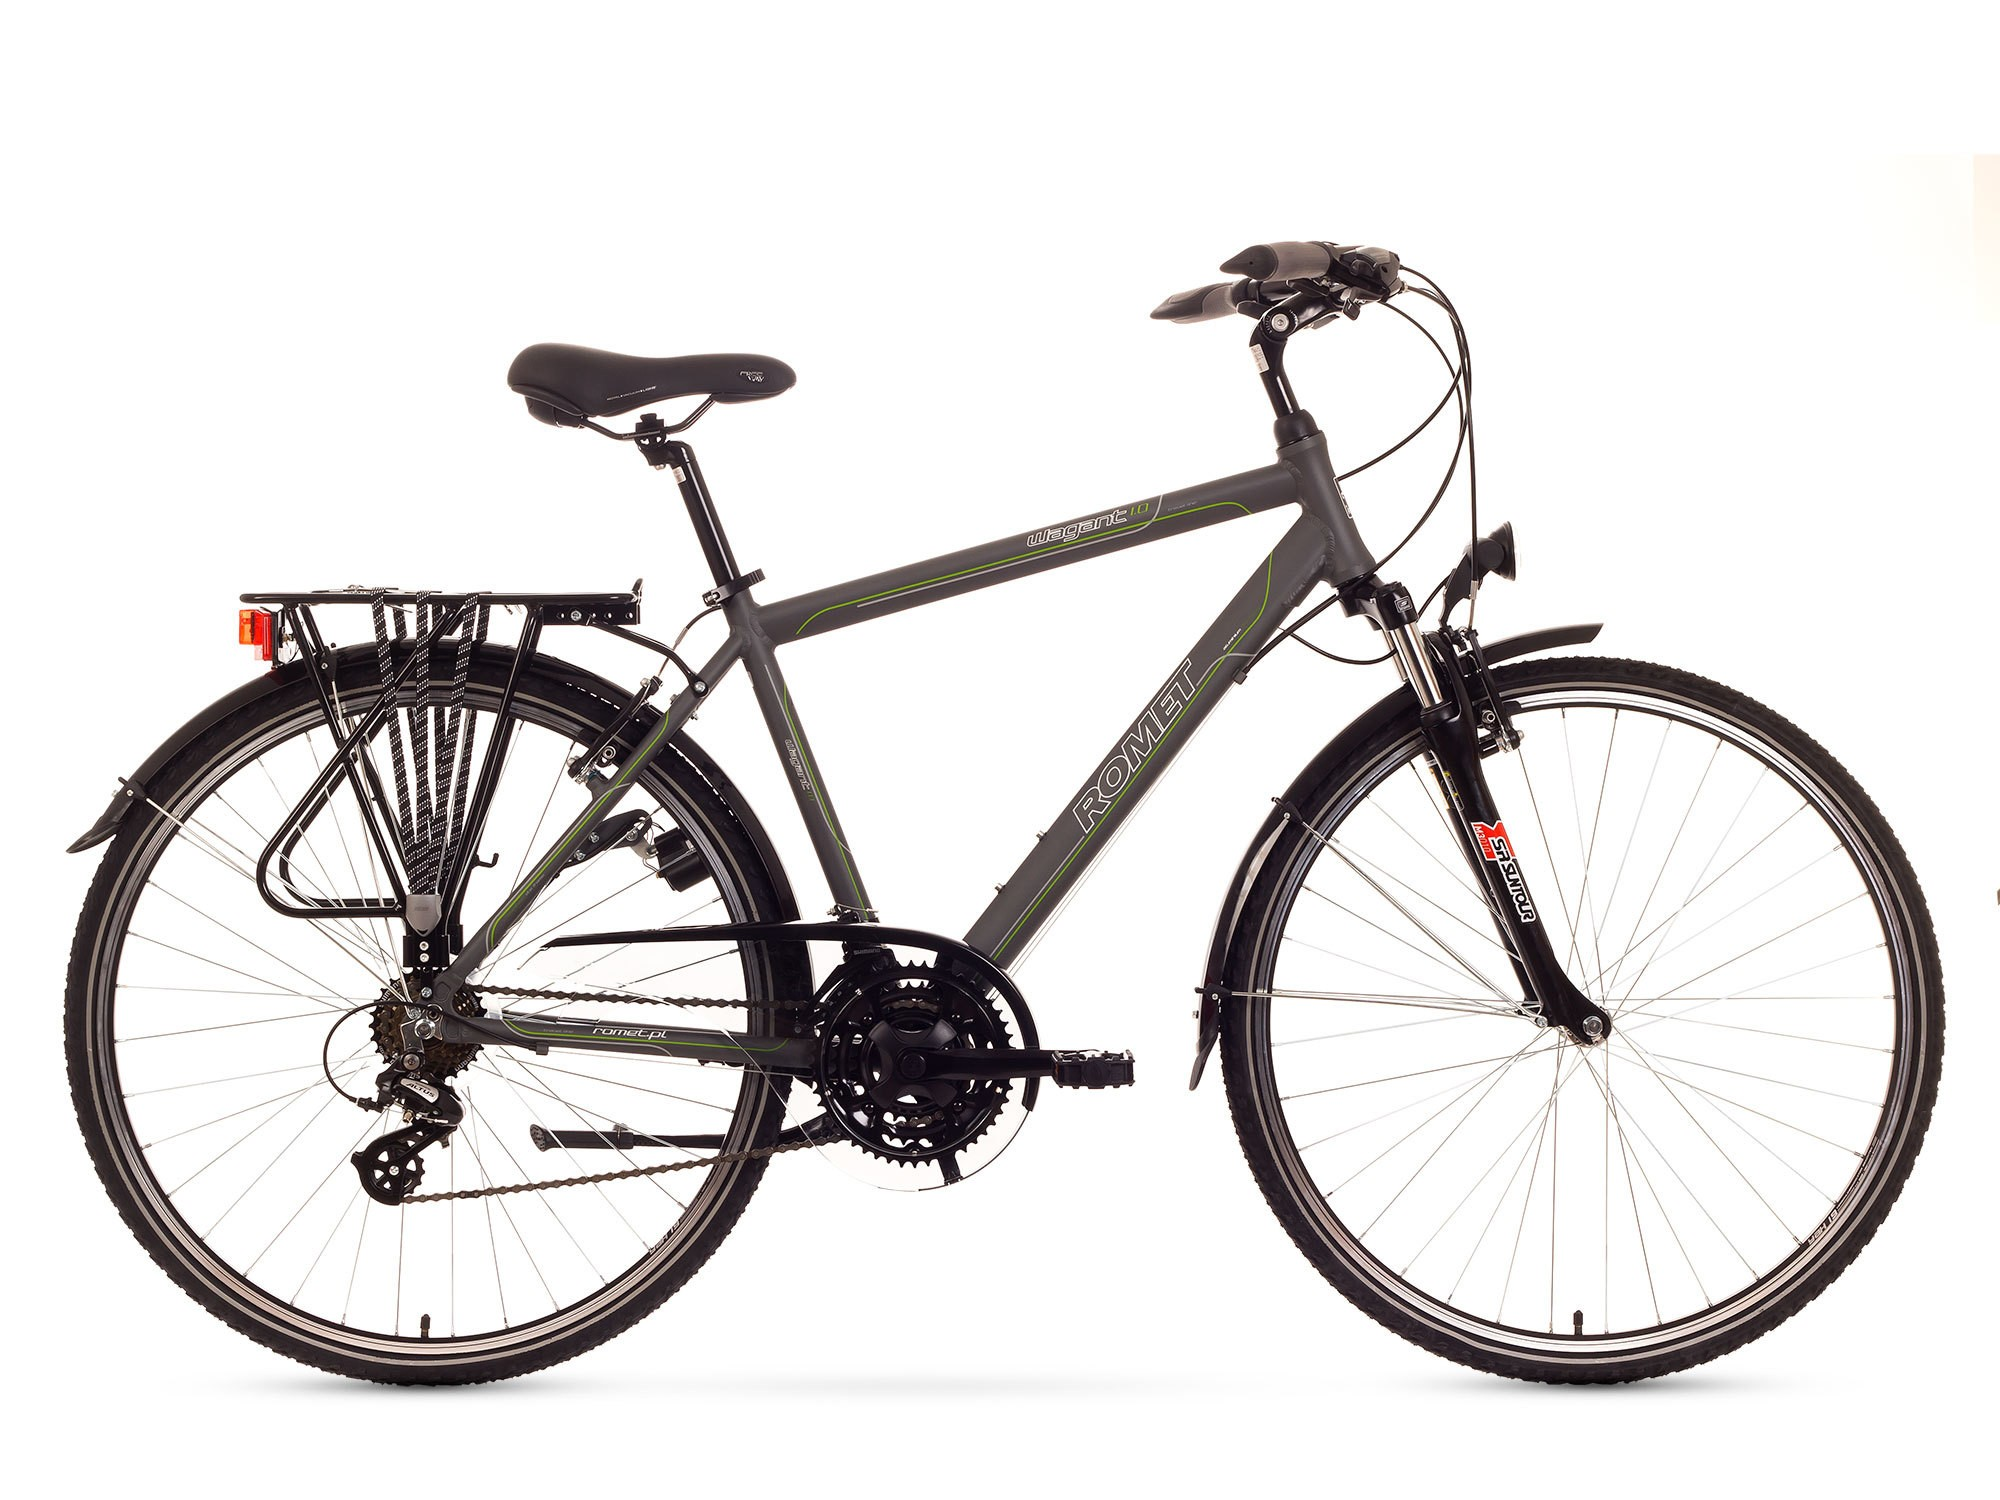 Bicicleta Trekking Romet Wagant 1.0 - grafit